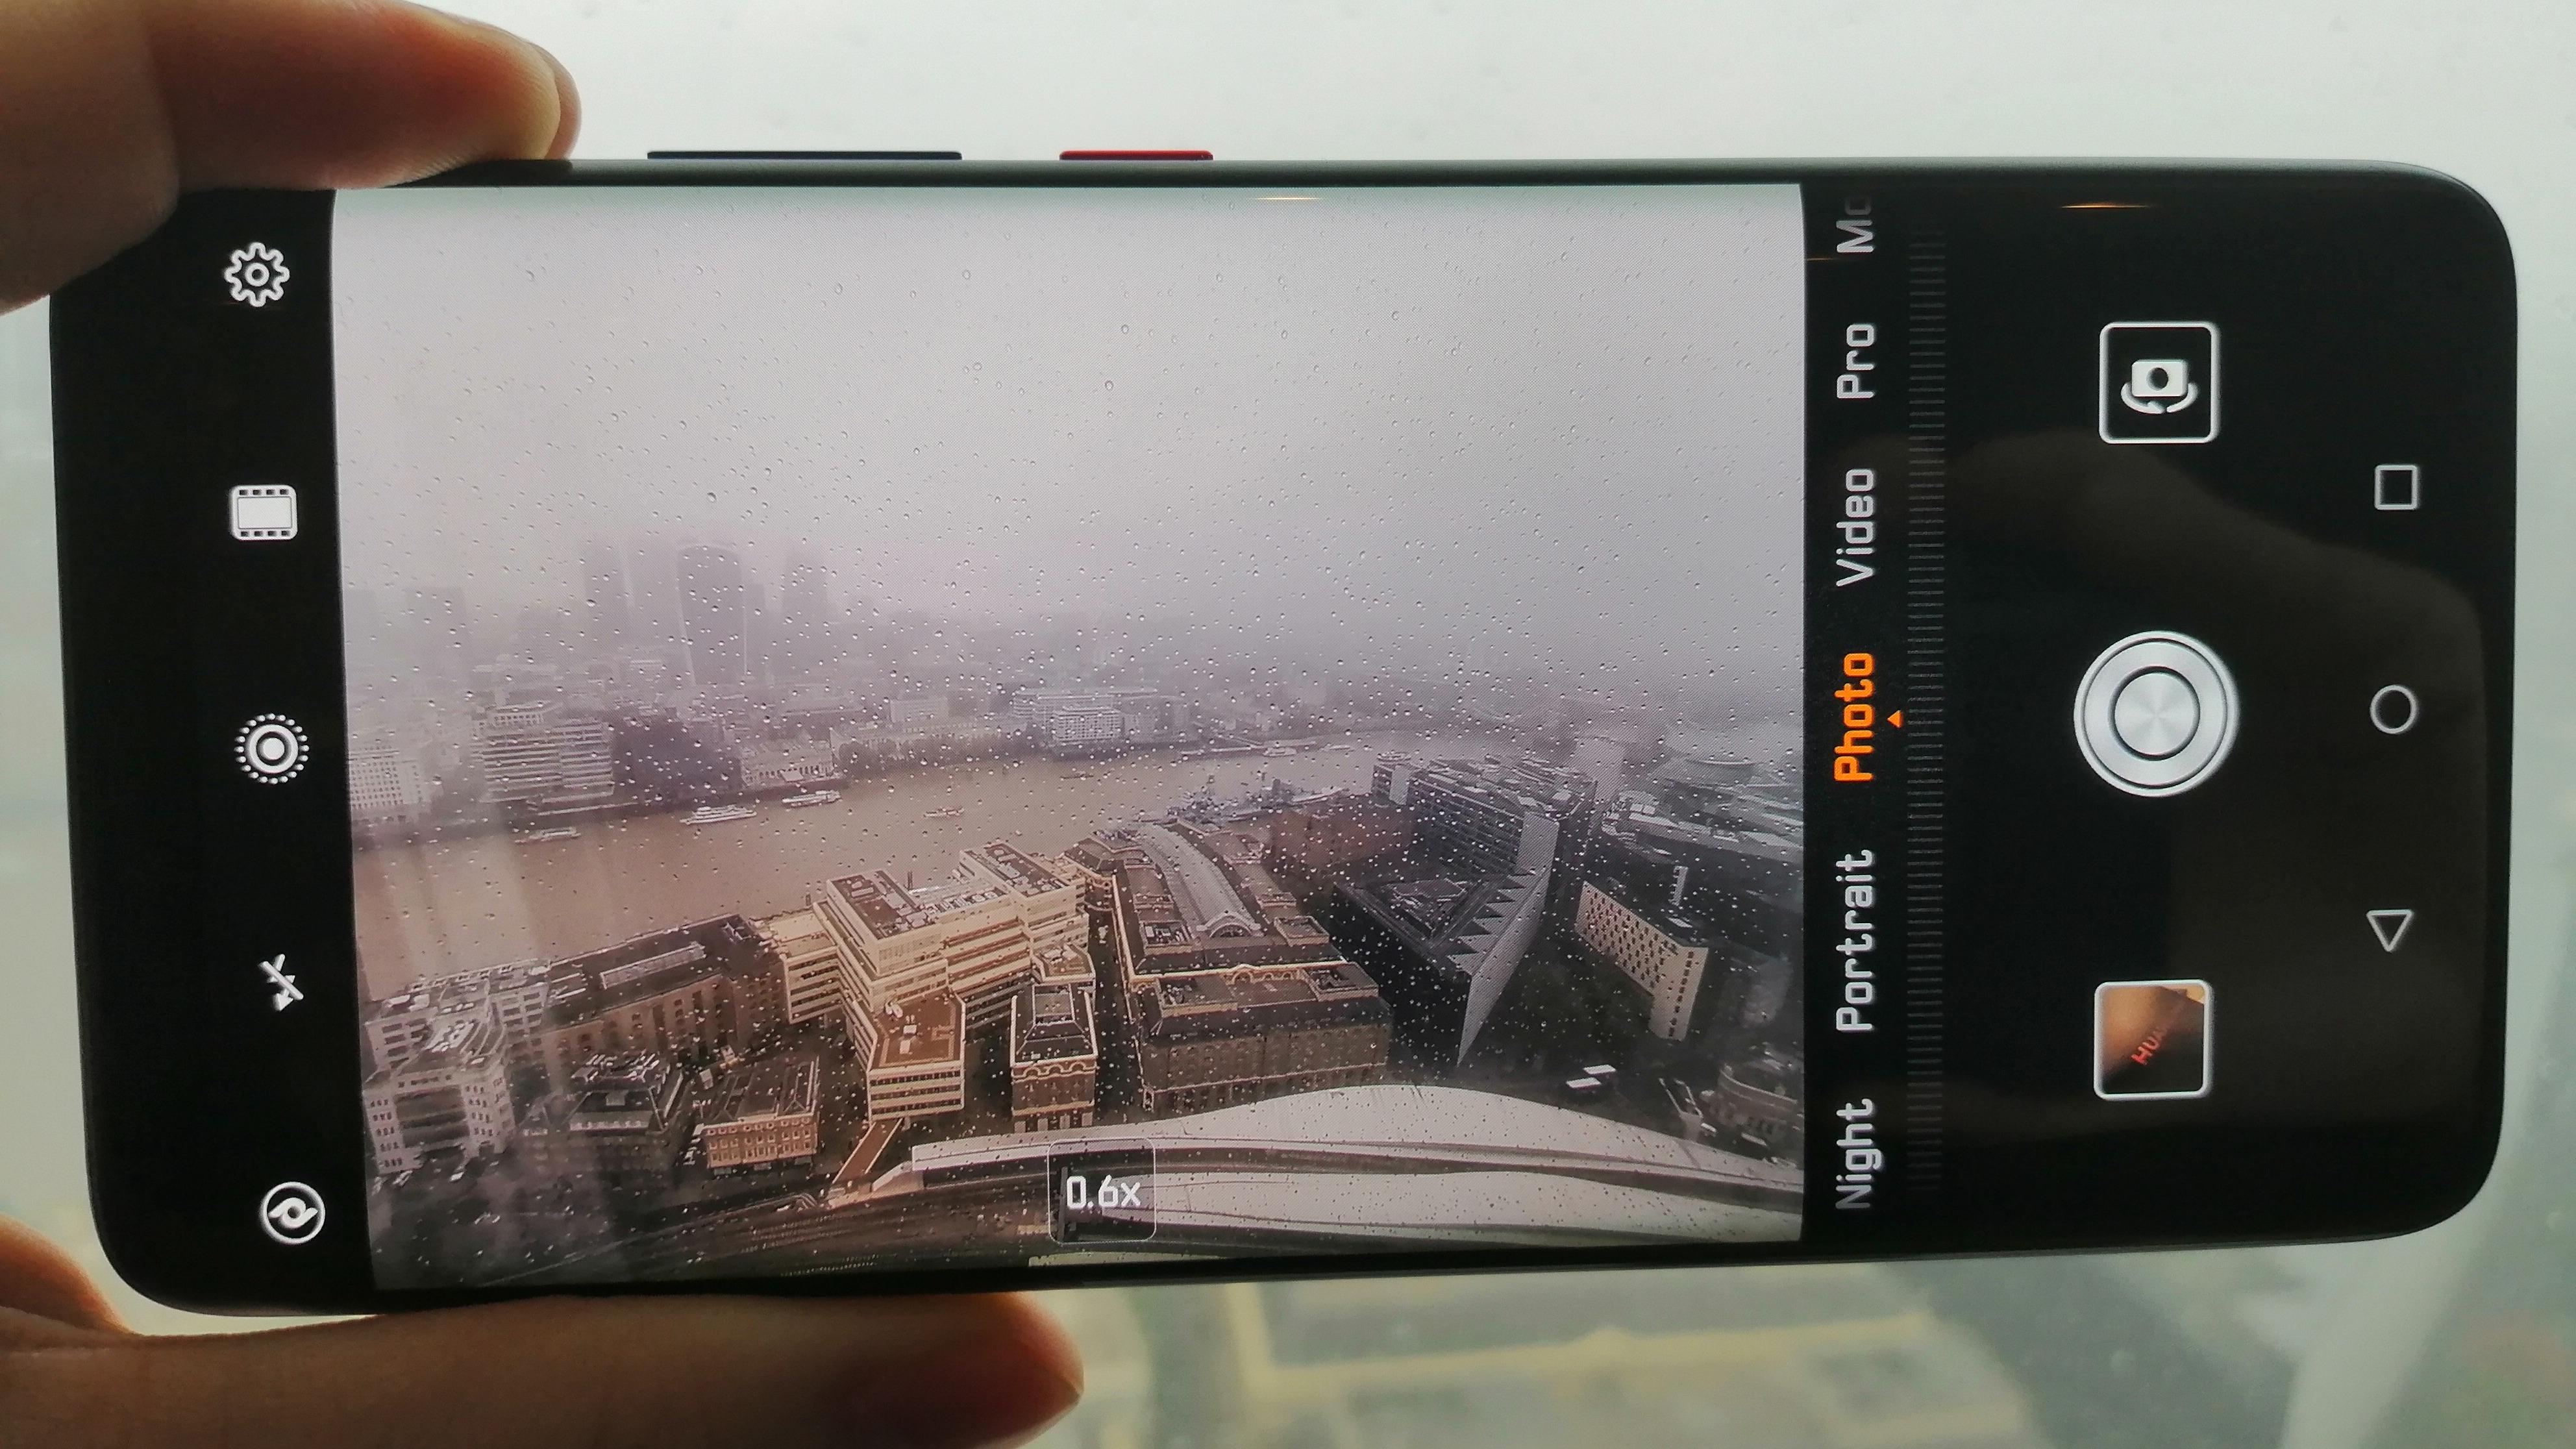 Huawei Launches the Mate 20 Series: Kirin 980 7nm SoC Inside